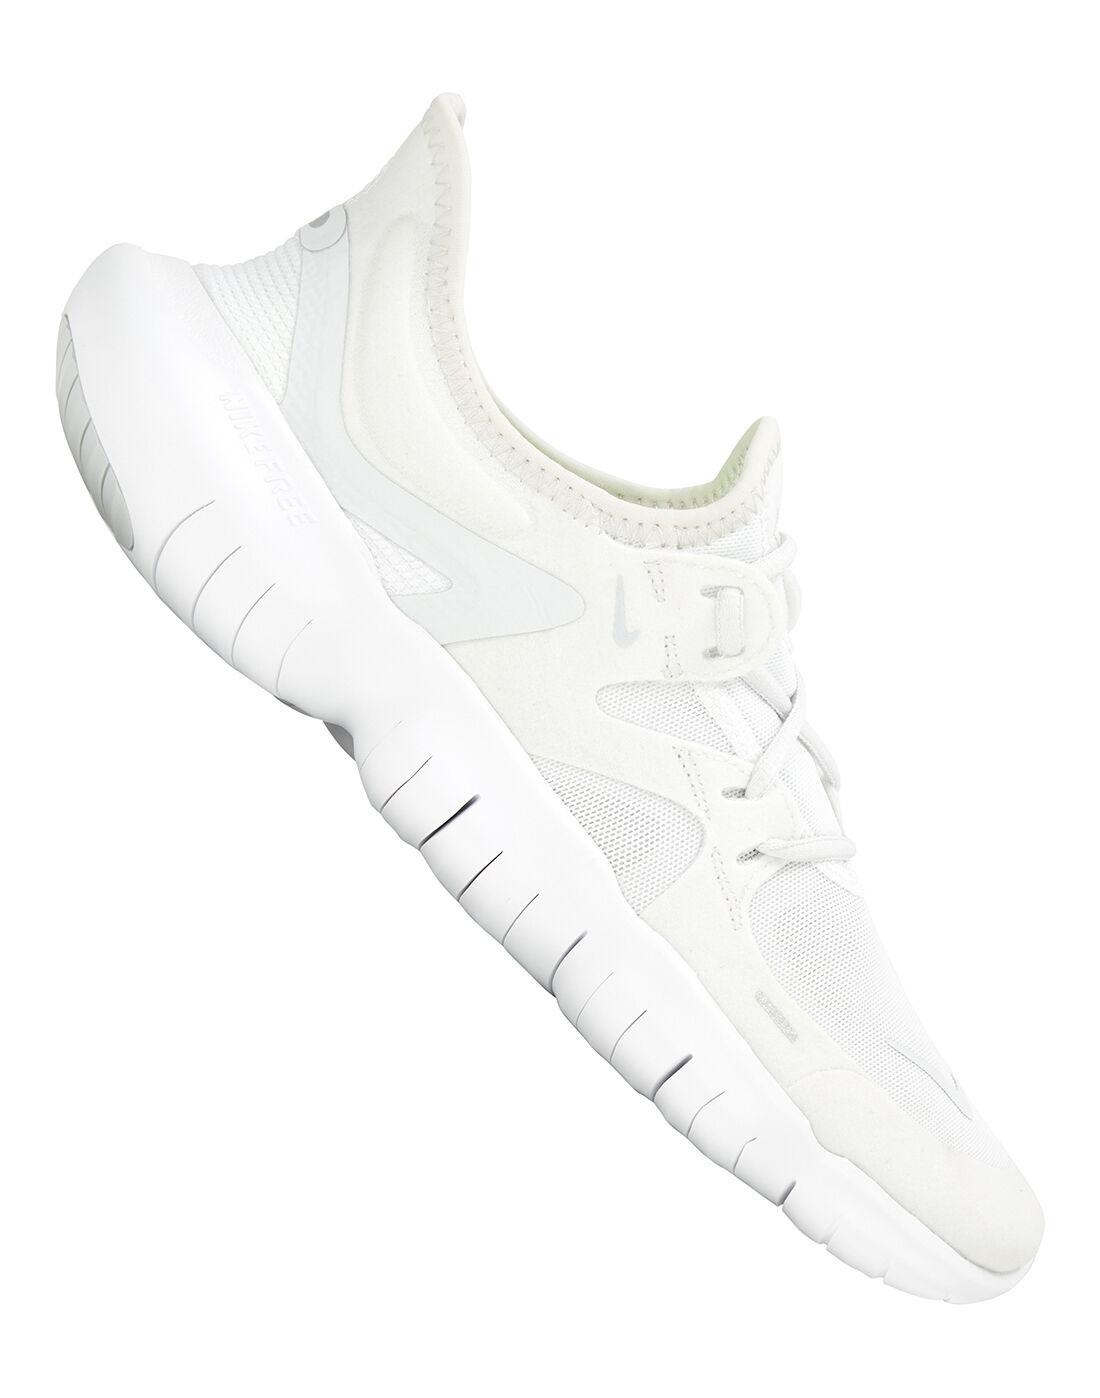 Women's White Nike Free Run 5.0 | Life